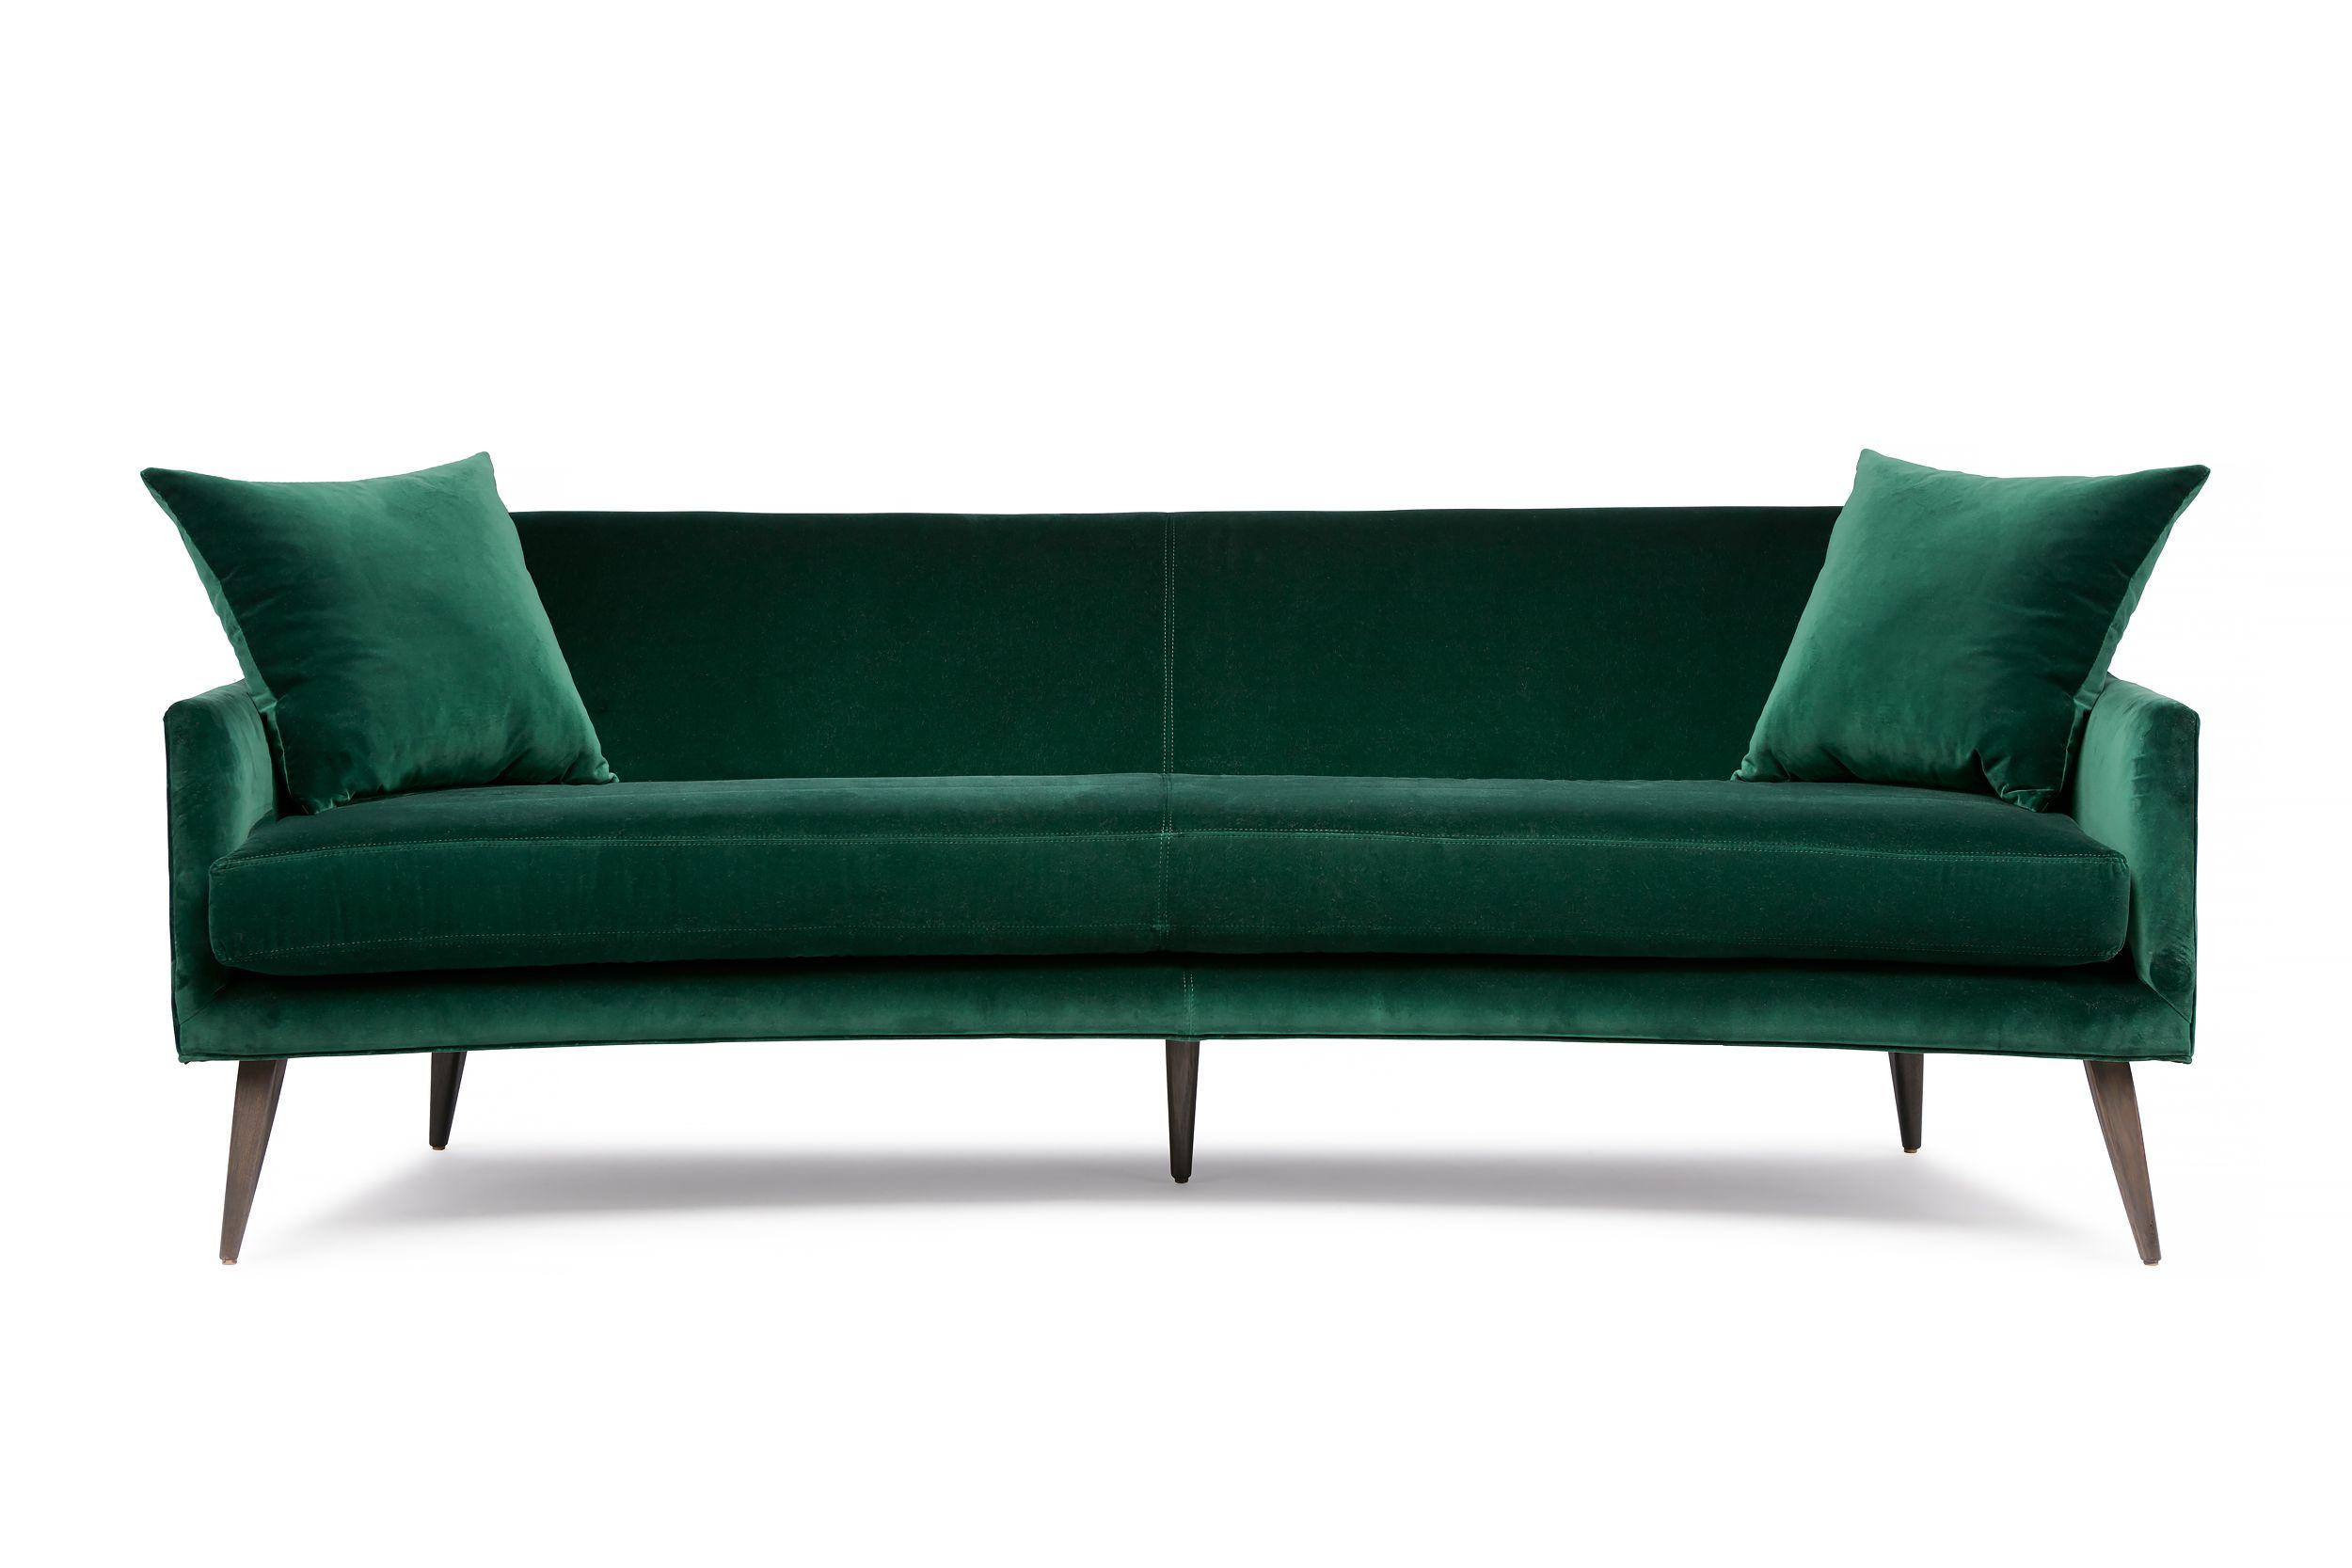 emerald green sofa covers baby velvet australia stkittsvilla